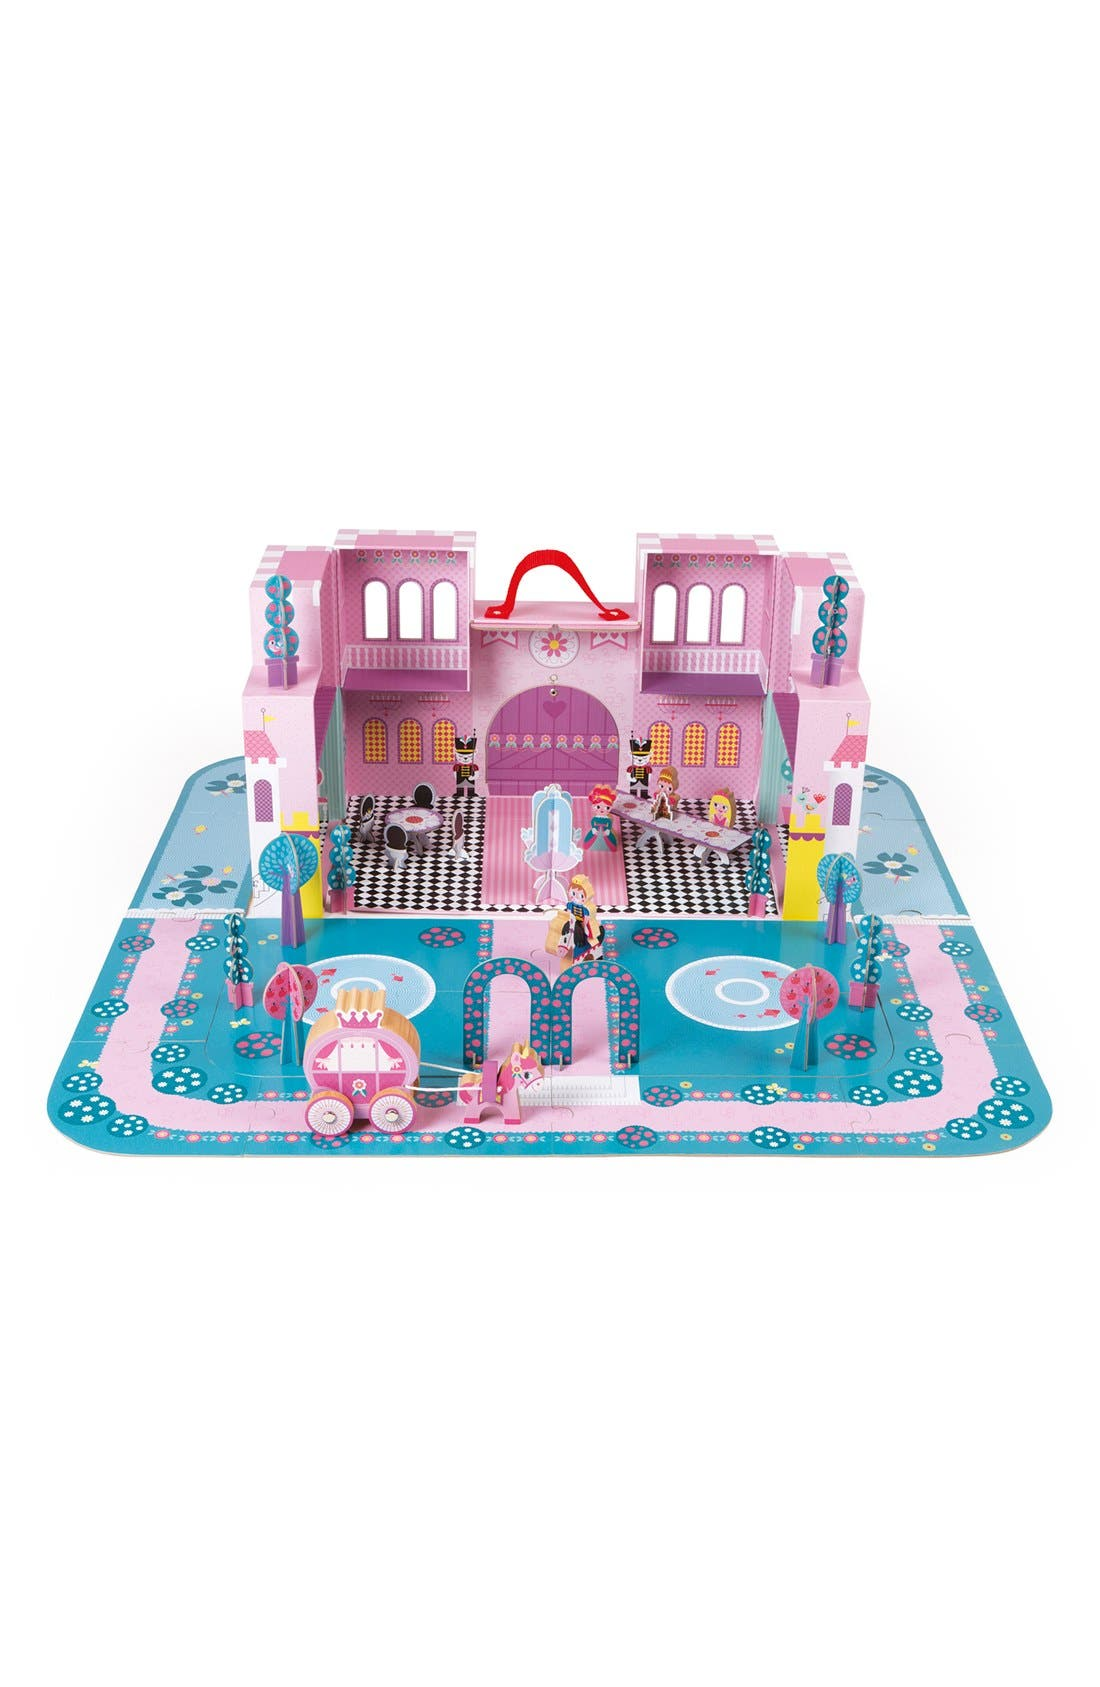 'Princess Palace' Play Set,                         Main,                         color, Multi